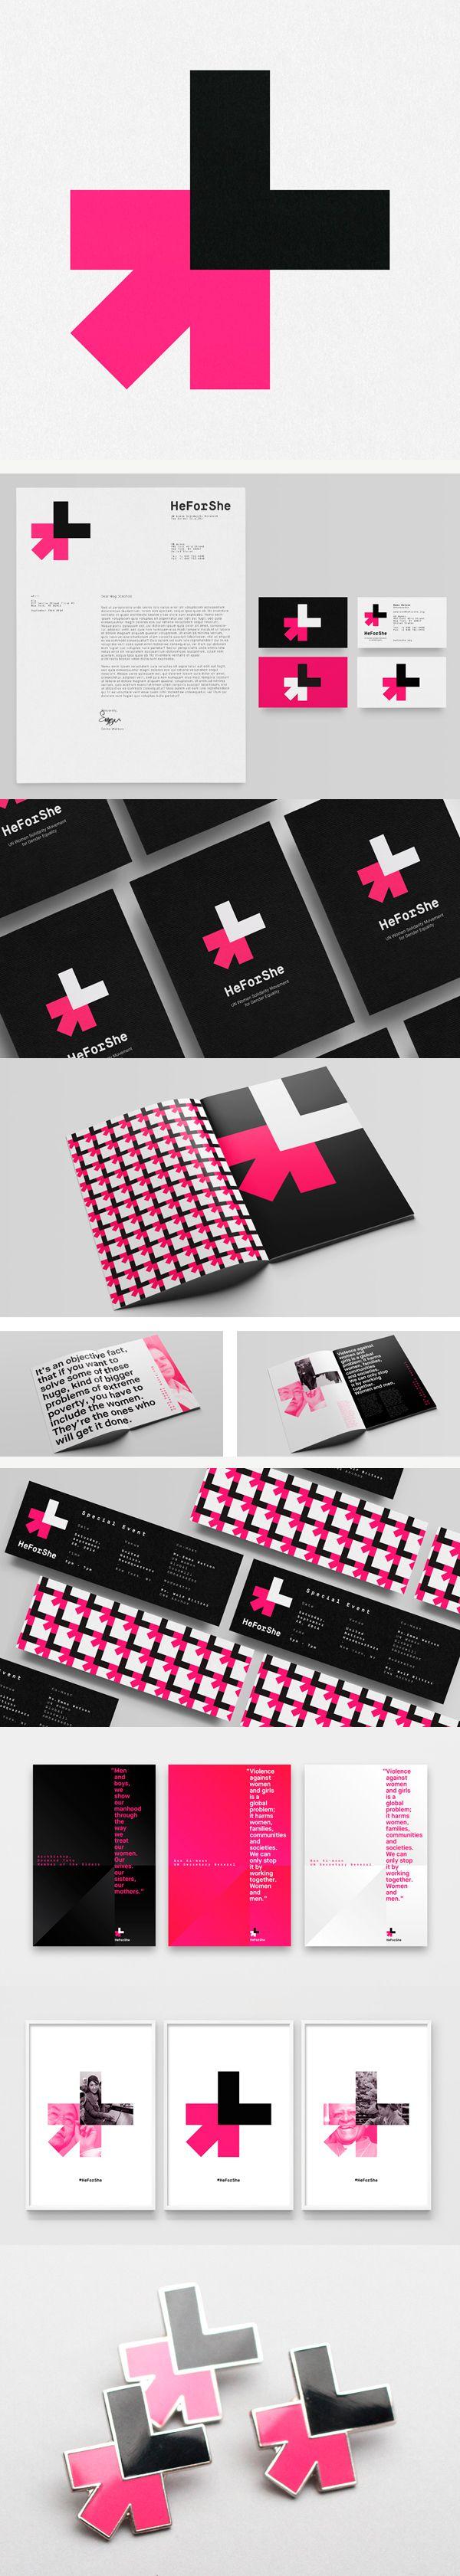 He For She #identity #design